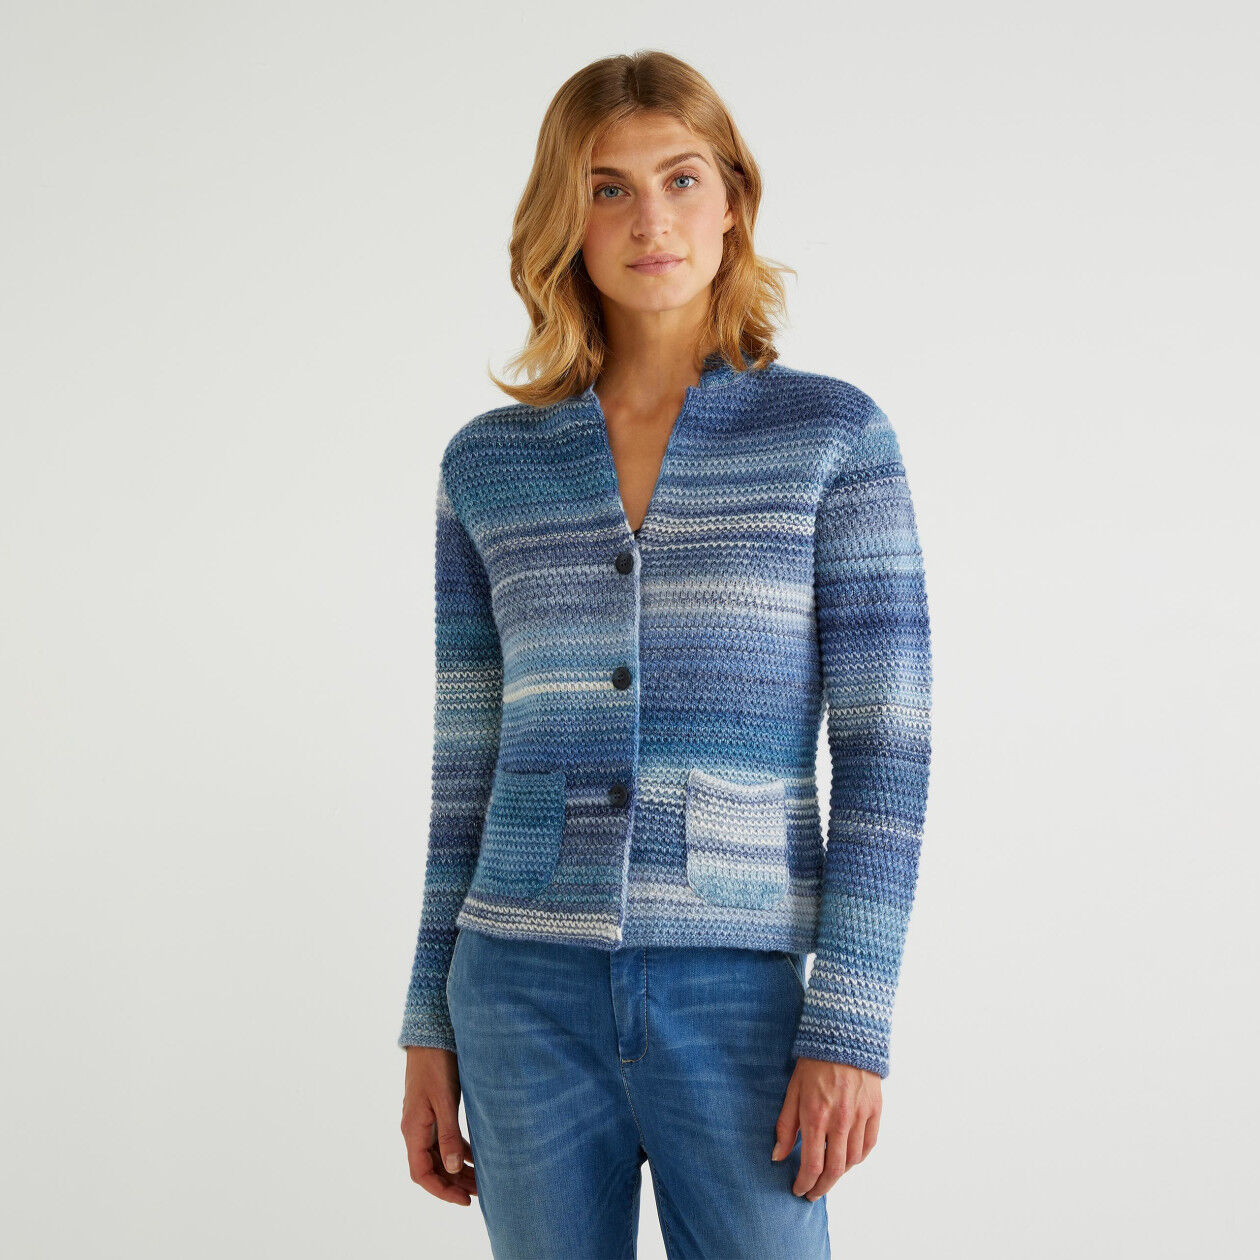 Multicolor knit jacket